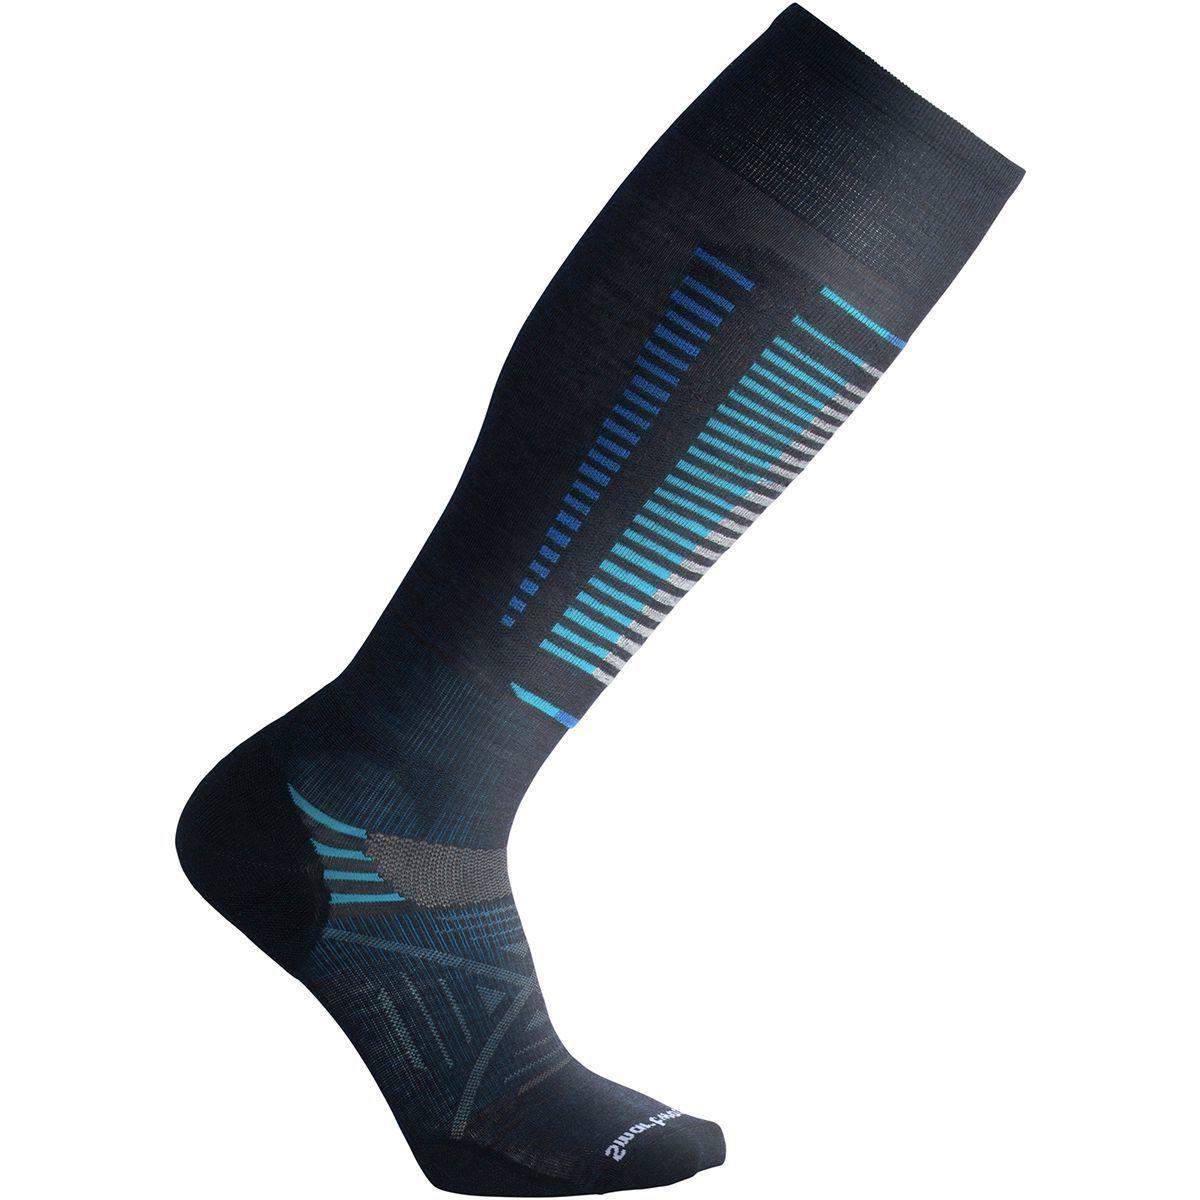 Smartwool Phd Pro Free Ski Sock - Men's